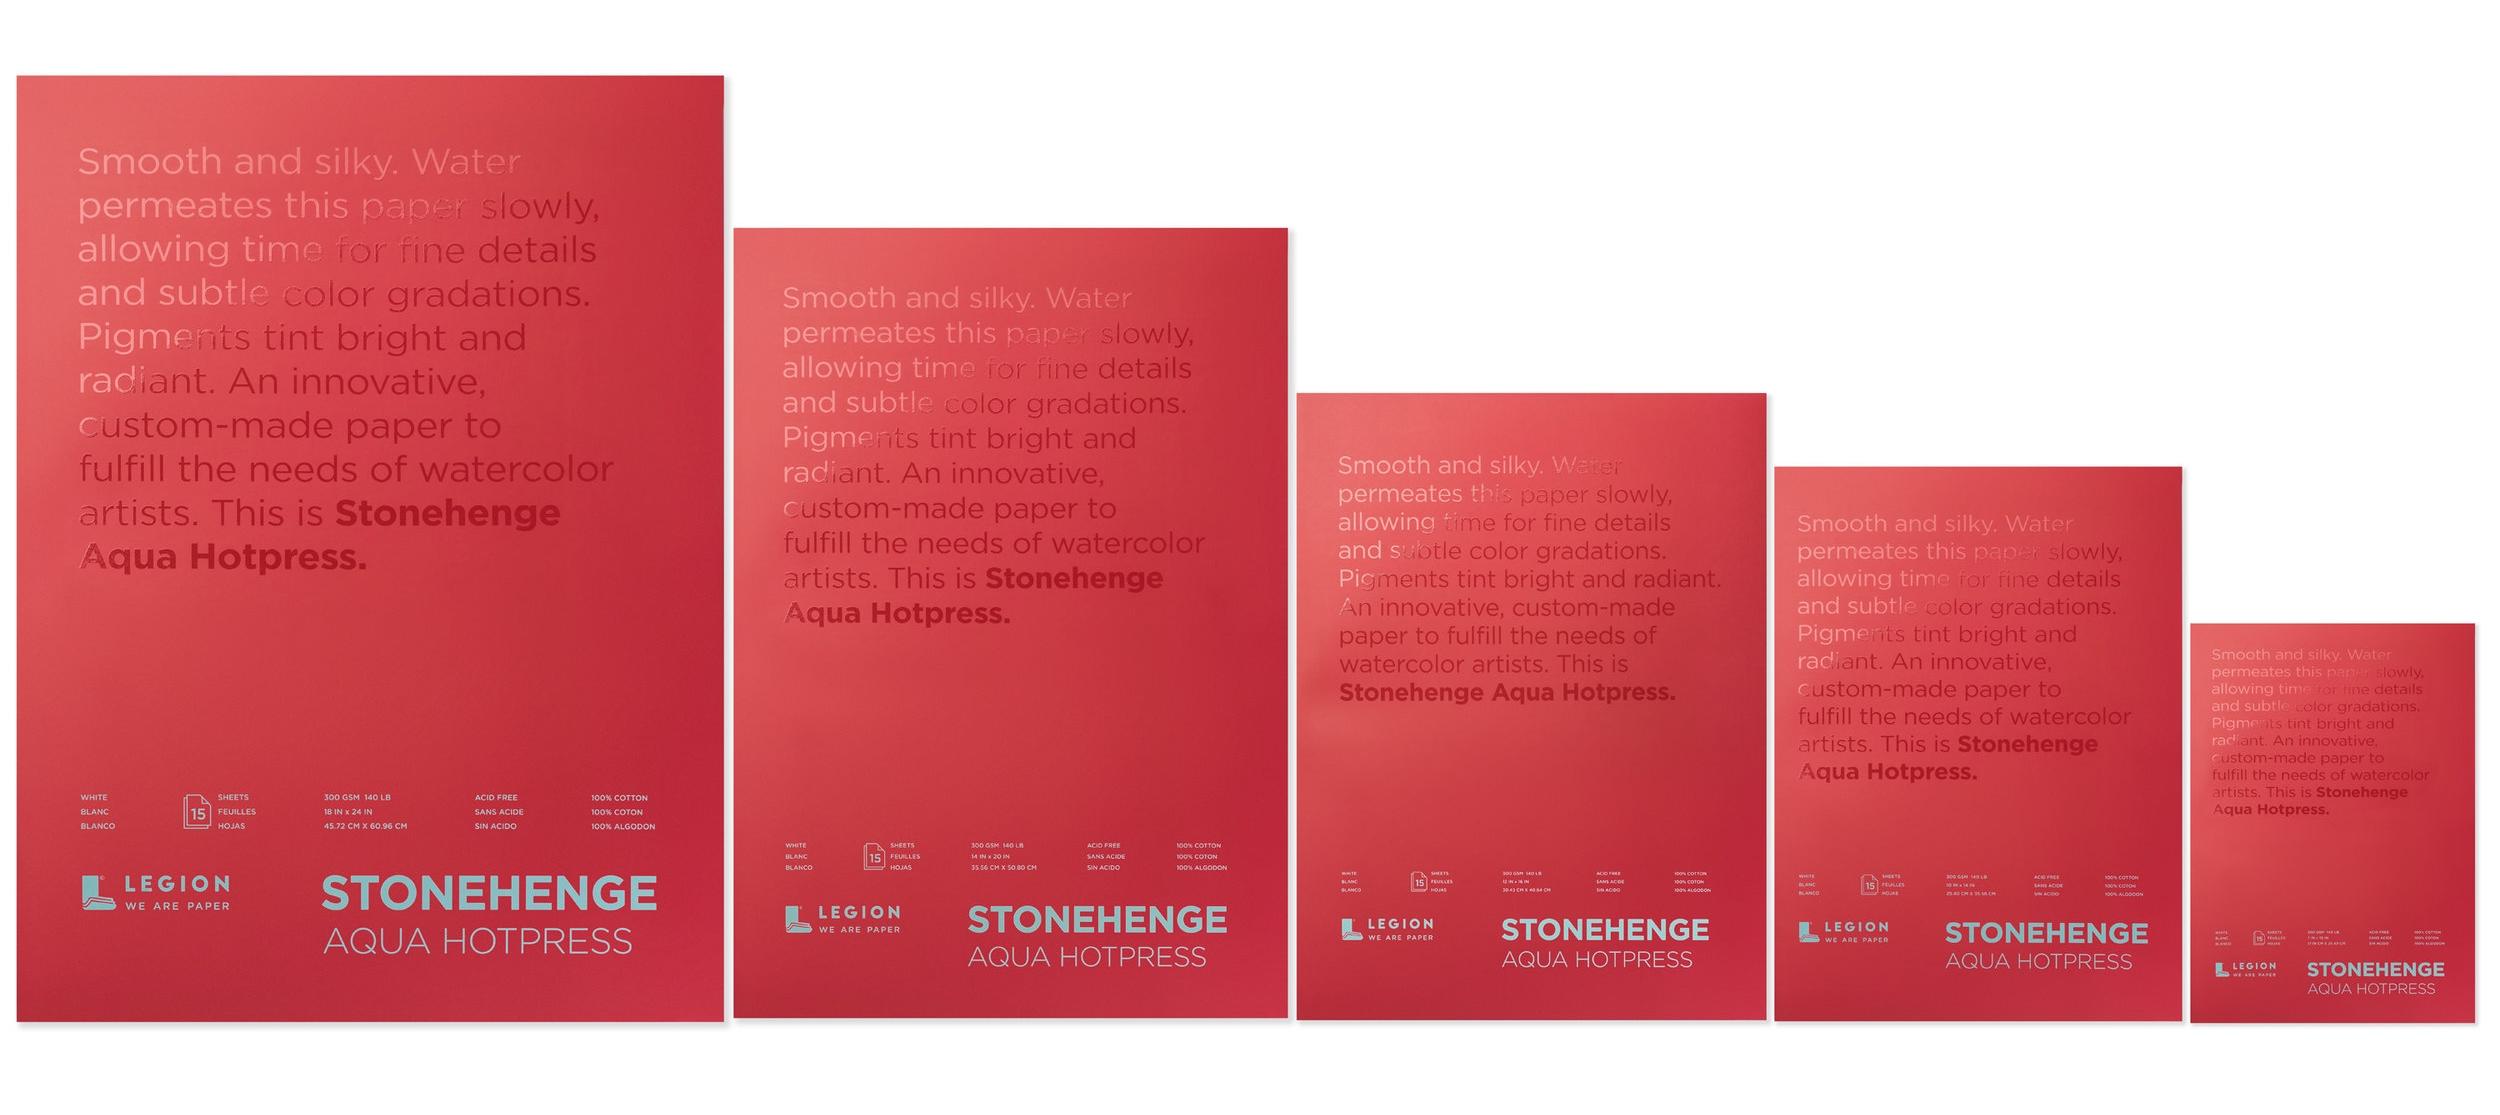 Stonehenge Aqua Art Pads for Watercolor